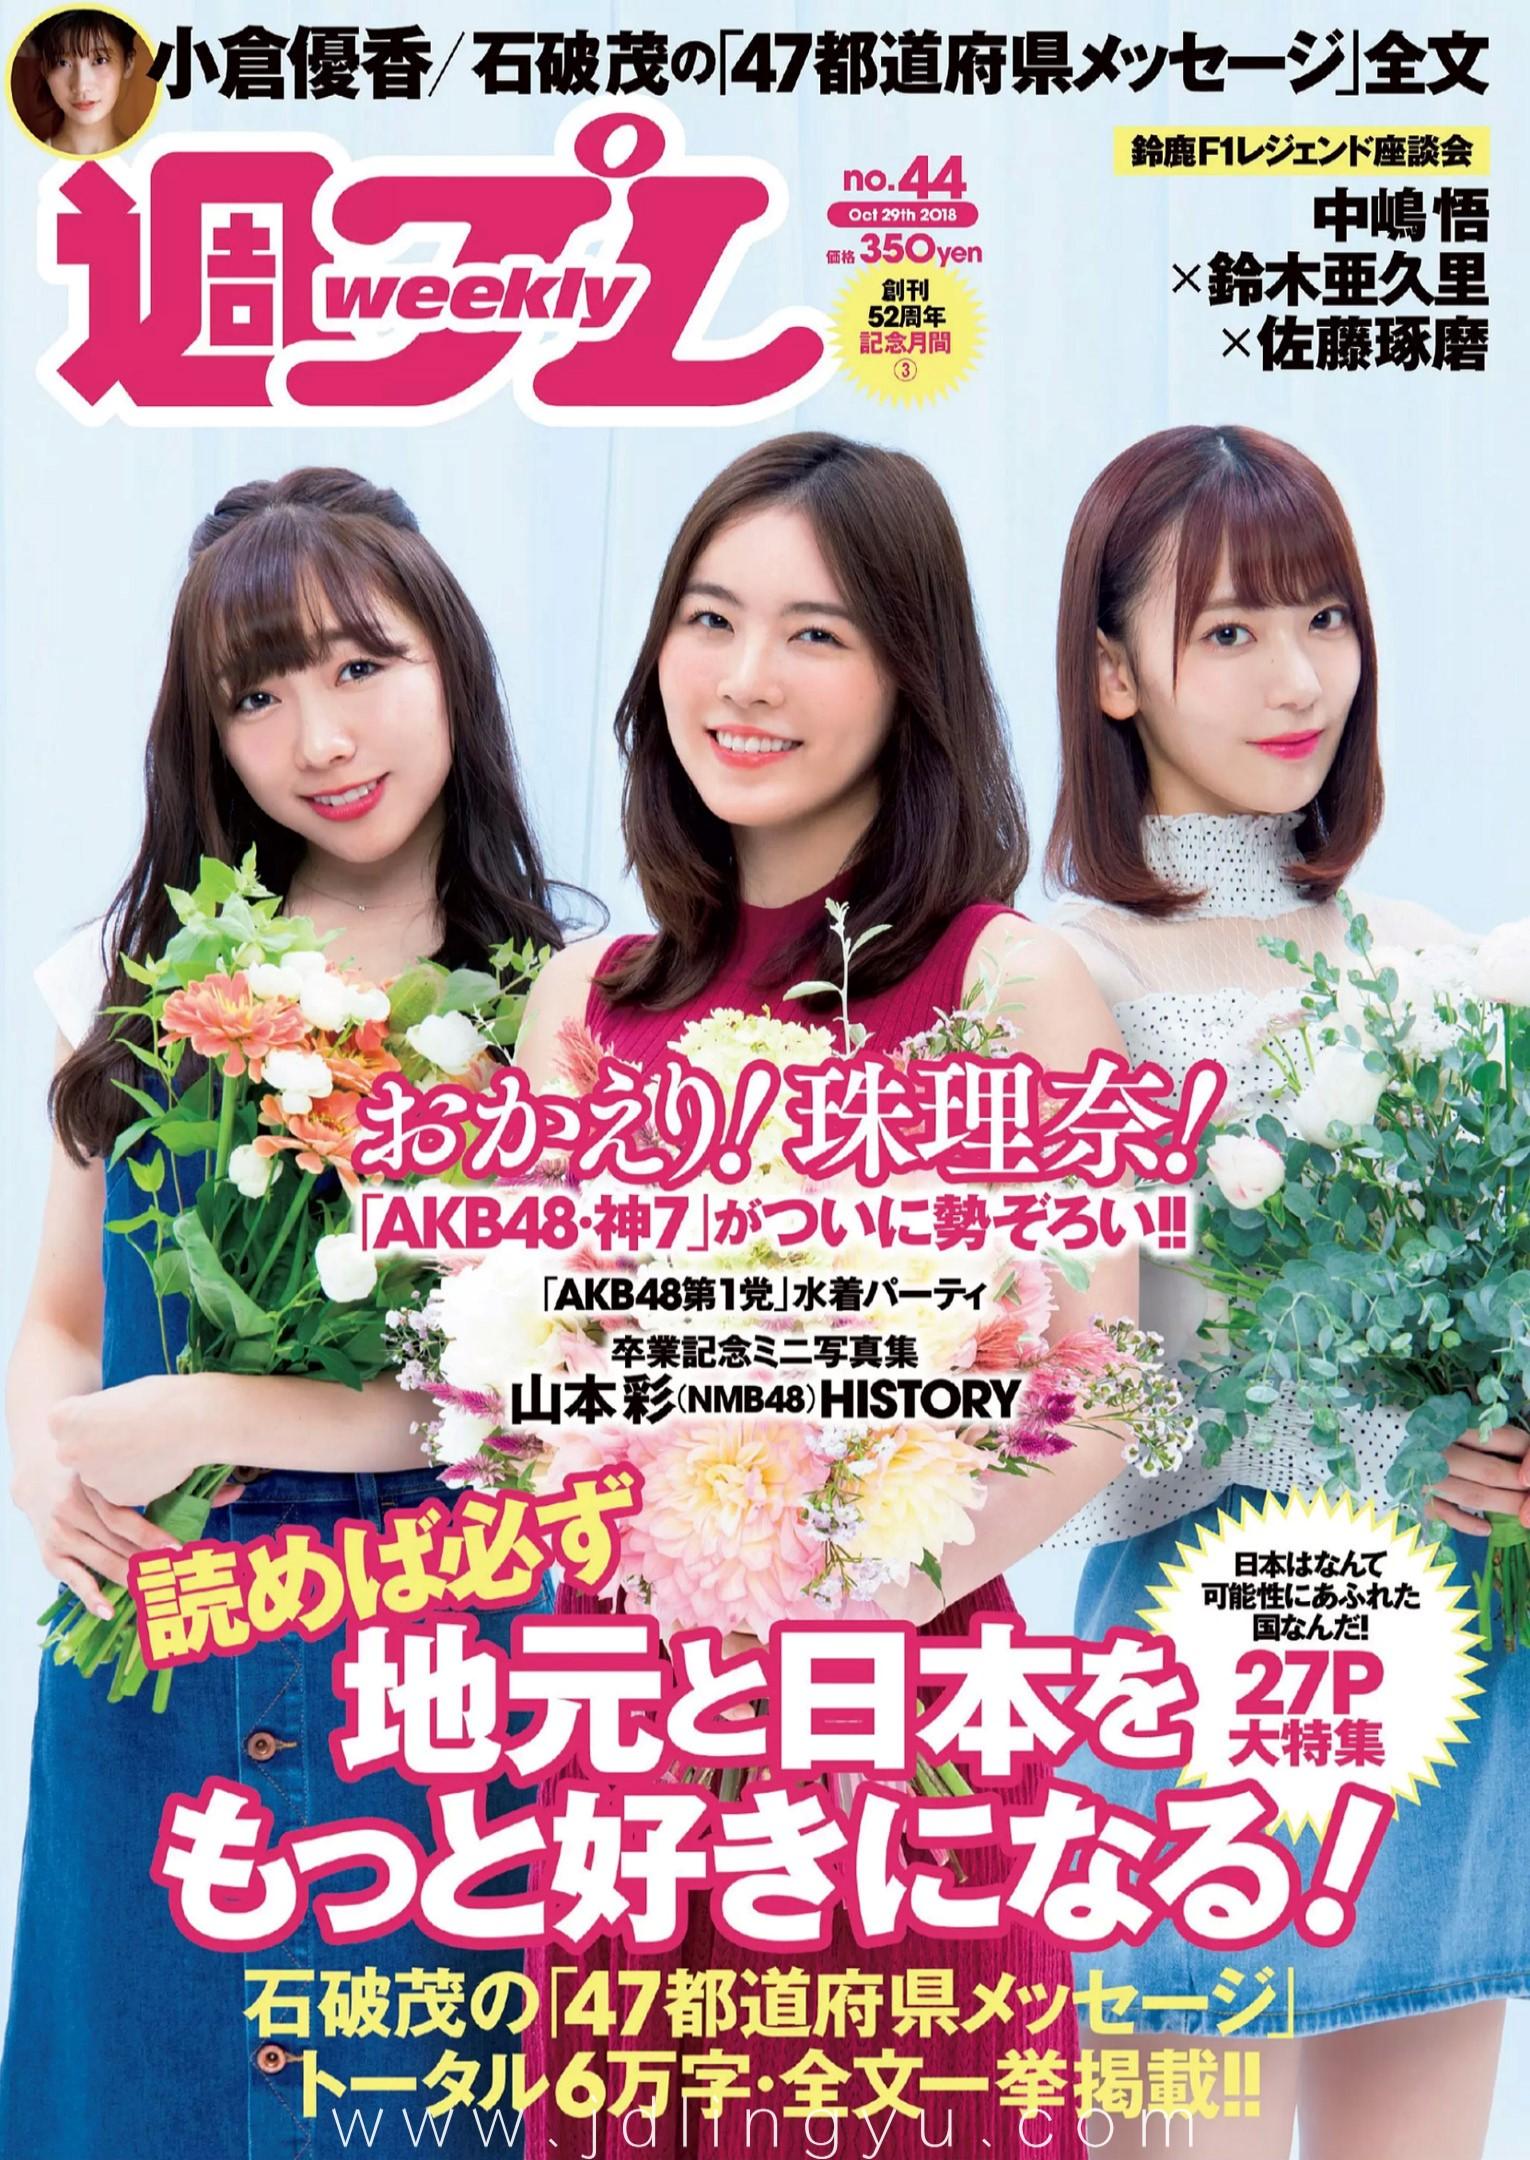 [Weekly Playboy] 2018 No.44 (松井珠理奈 AKB48 小倉優香 久間田琳加 逢沢りな 山本彩 他)